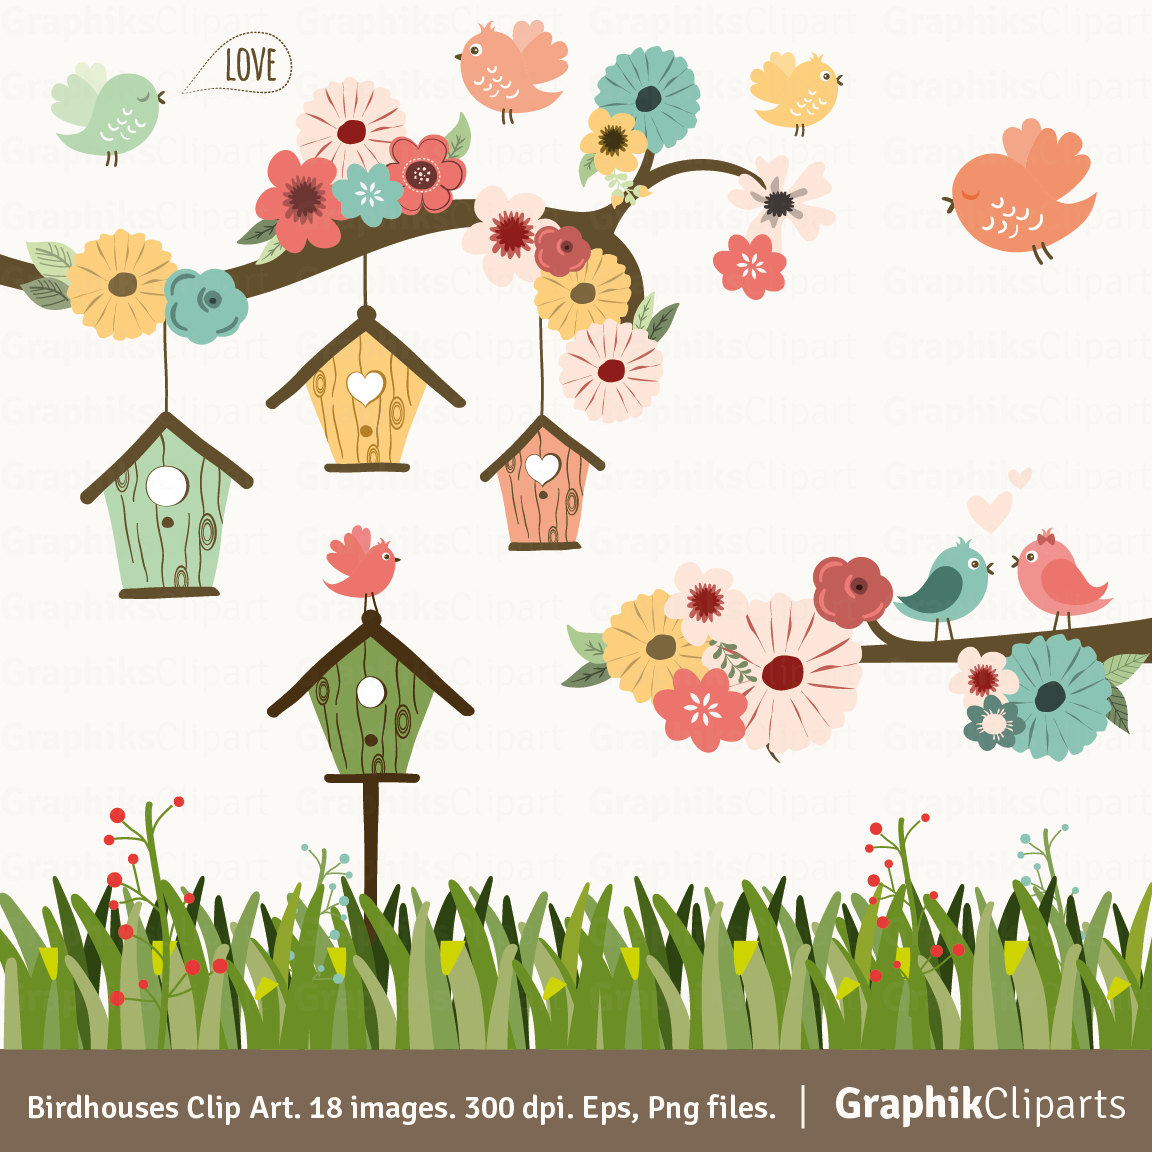 Birdhouses floral garden spring. Birds clipart flower